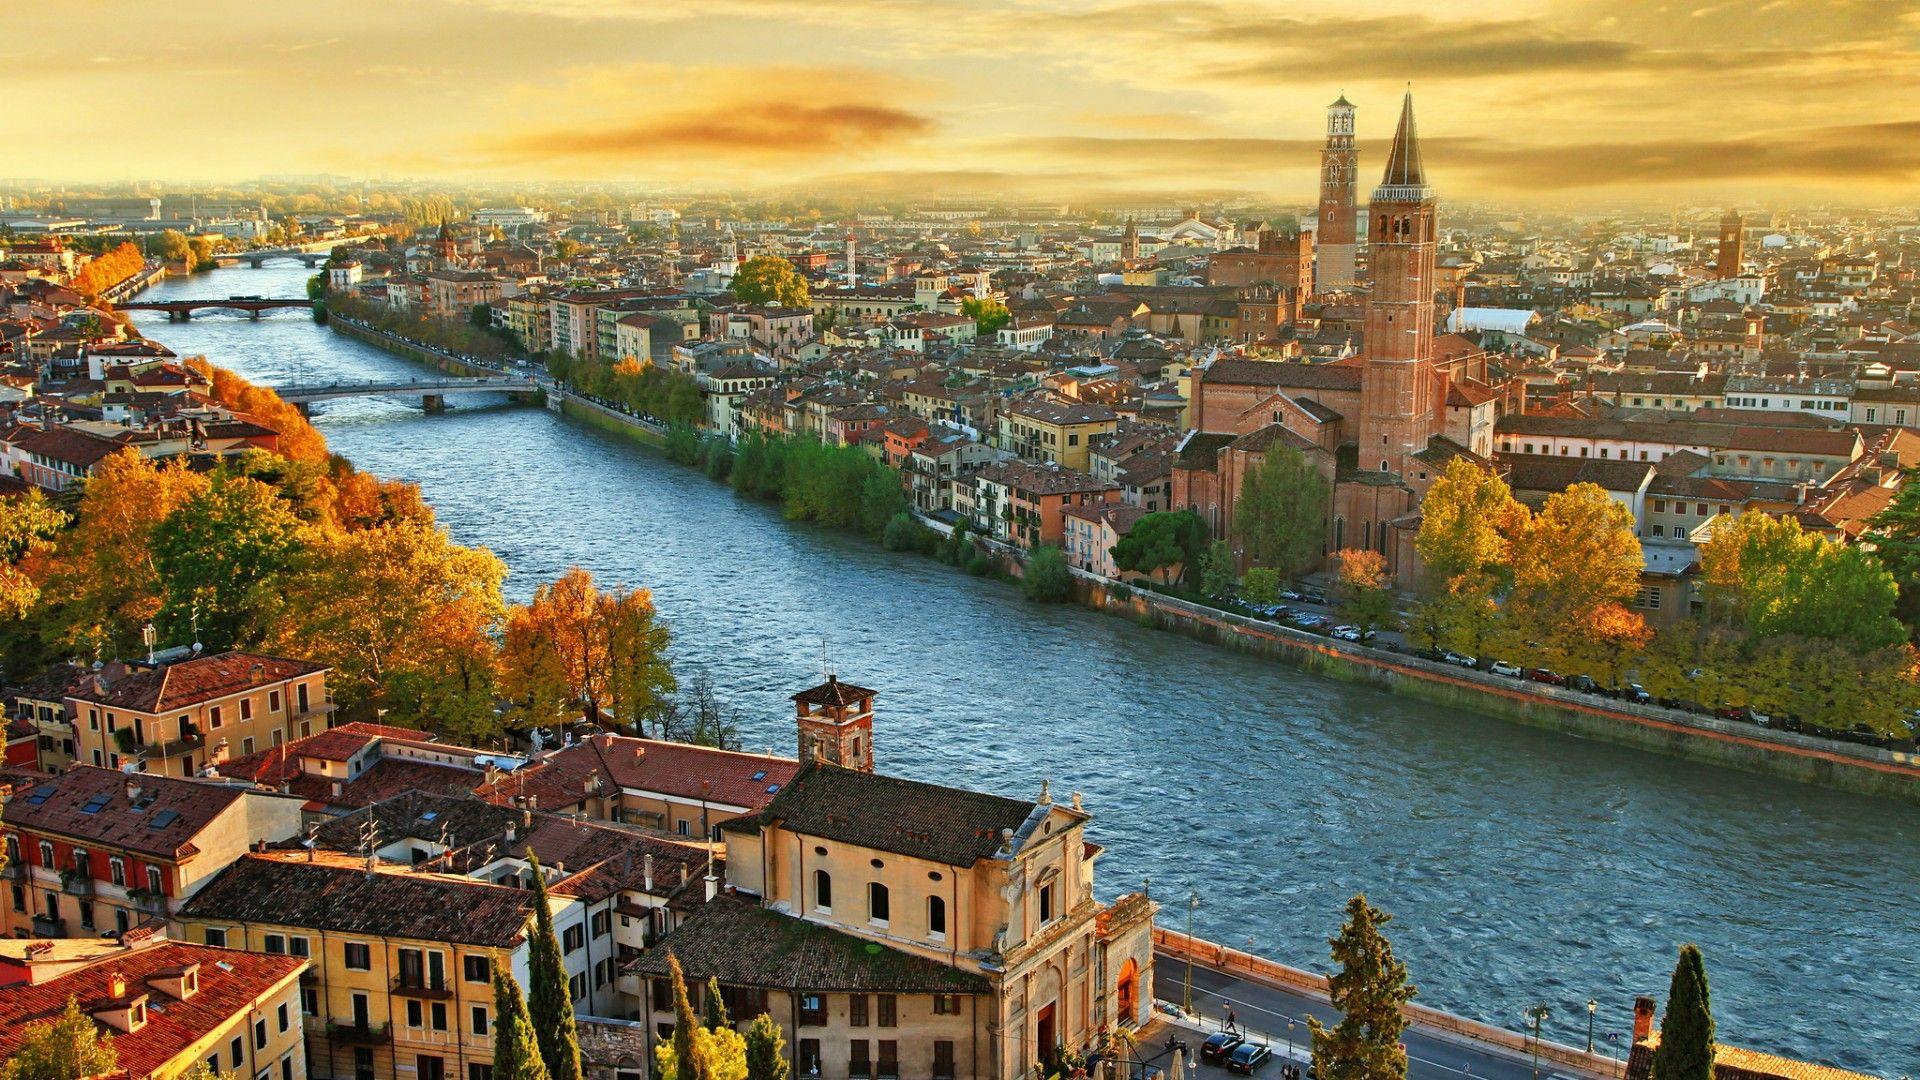 Free Desktop Backgrounds Italy